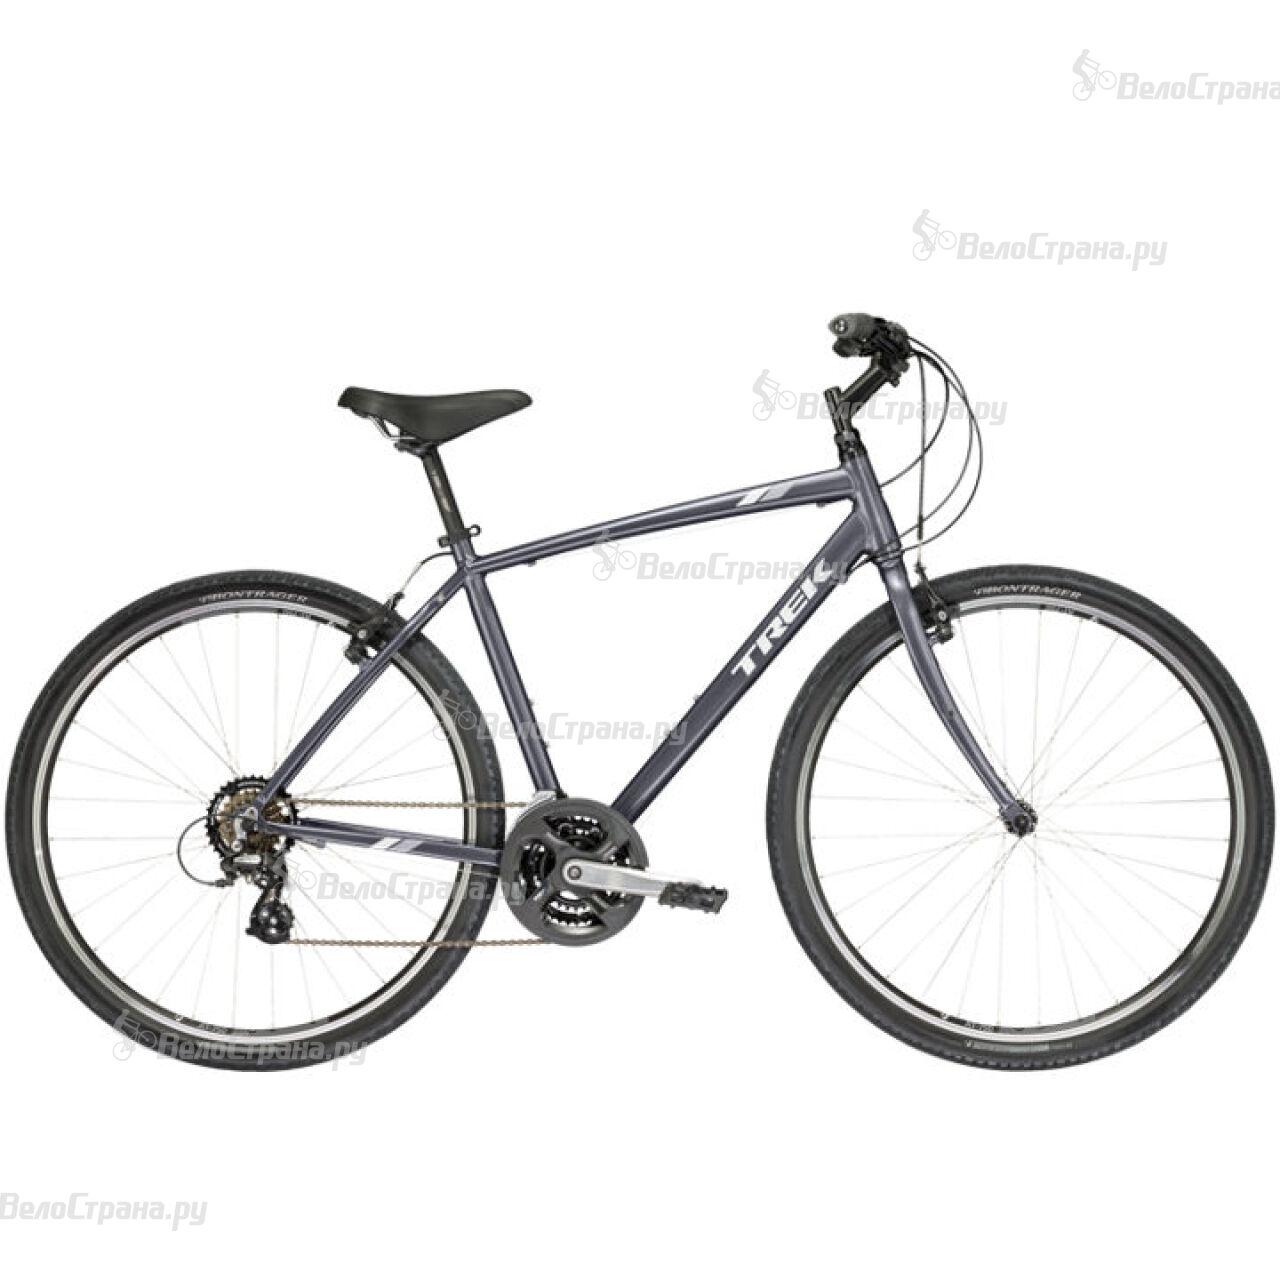 Велосипед Trek Verve 1 (2017) велосипед trek verve 2 2014